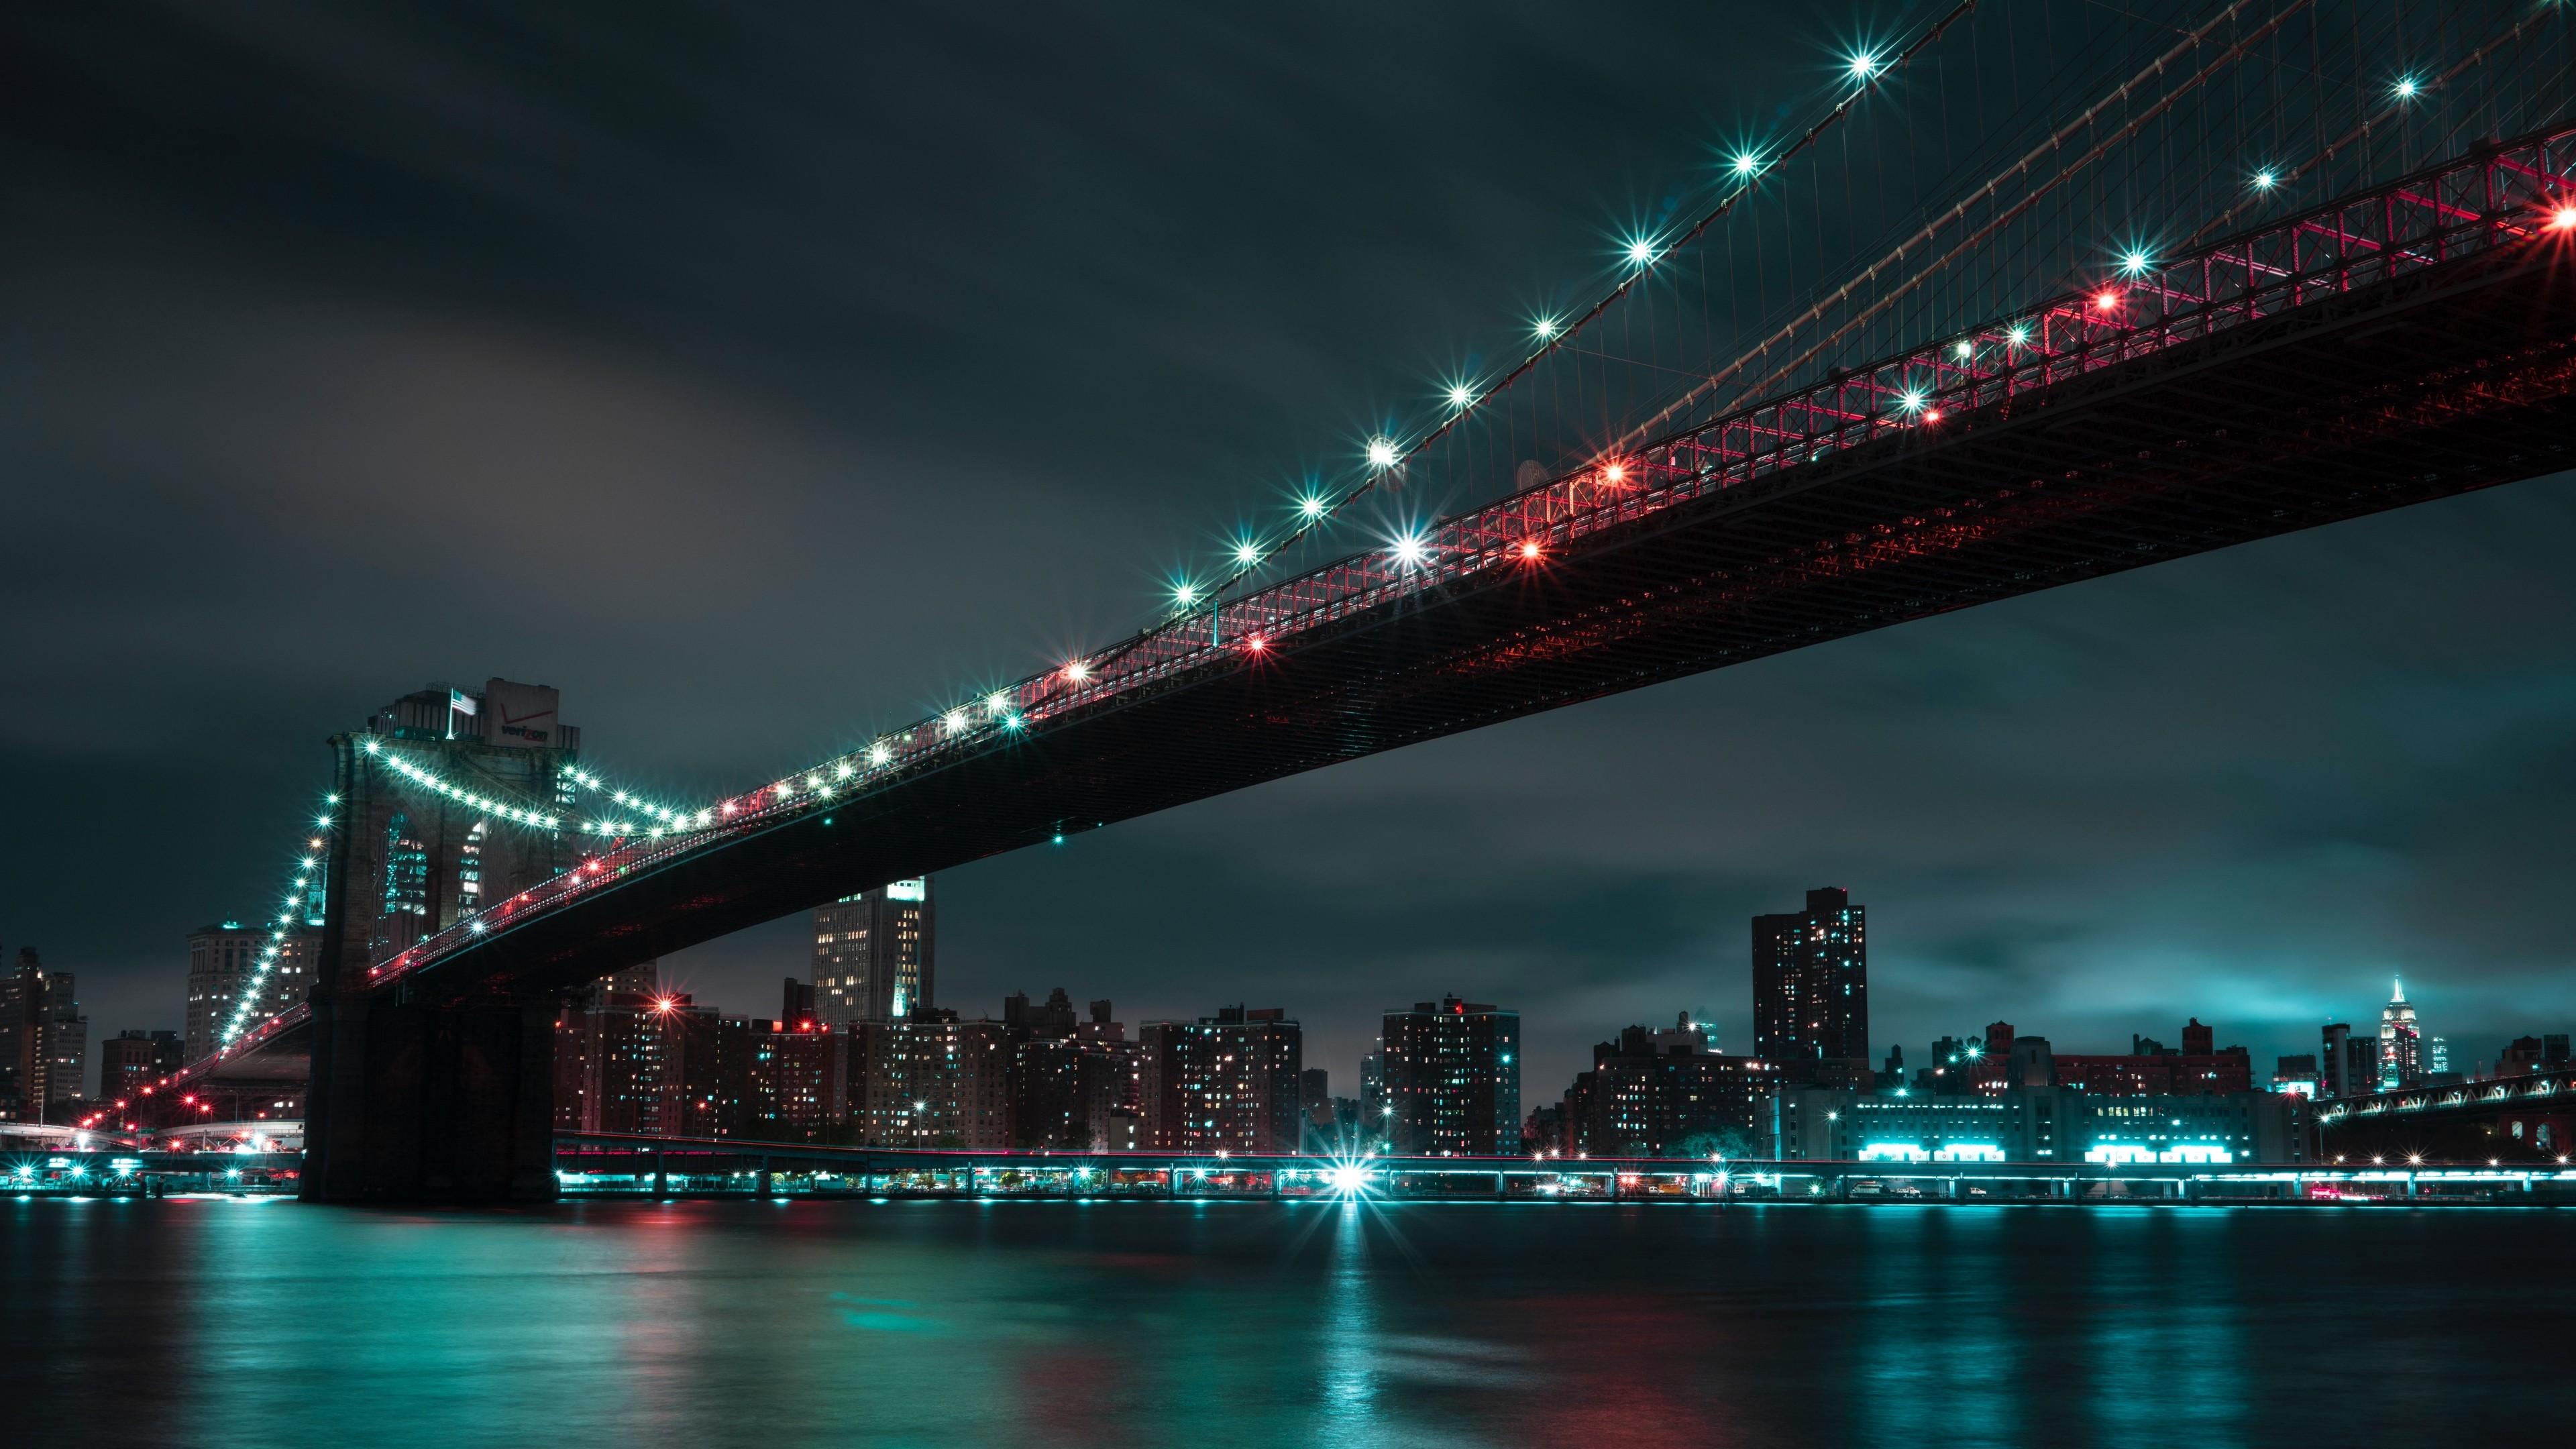 4k Bridge Night City Lights Wallpaper 3840x2160